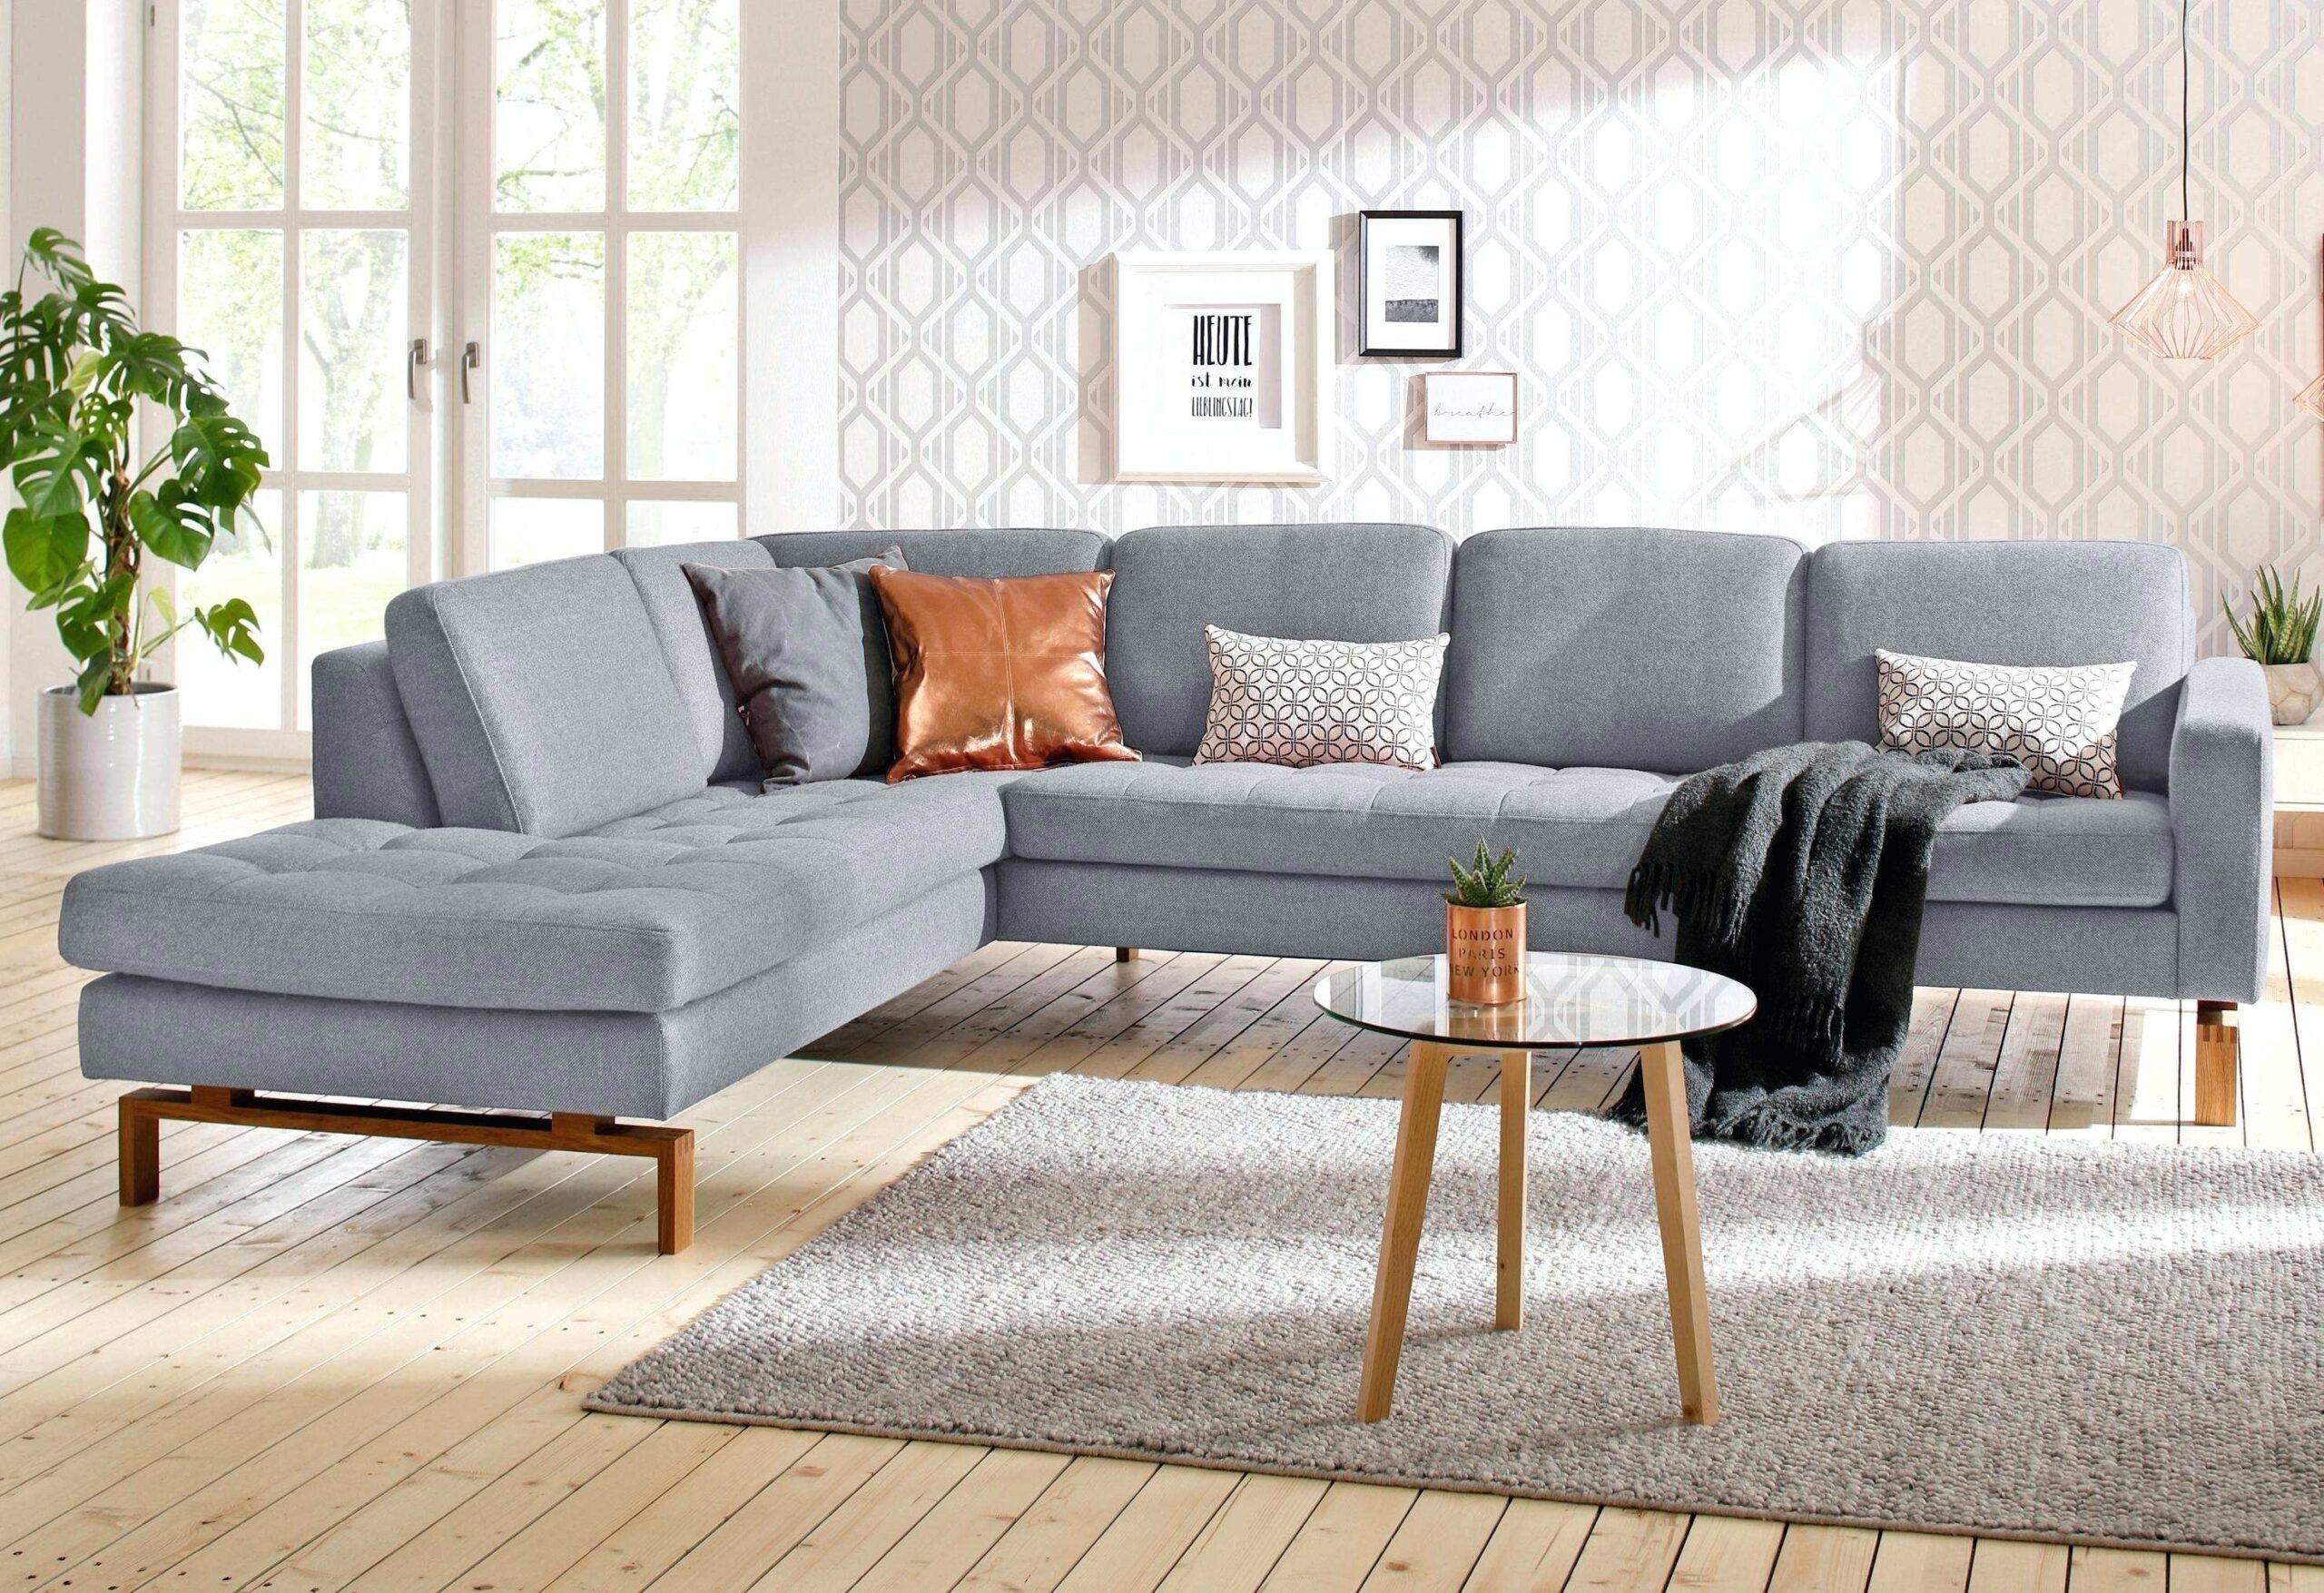 Full Size of Ecksofa U Form Neu L Couch Gnstig Simple Xxl Sofa Big Le Corbusier Landhaus Angebote Patchwork Rolf Benz Hersteller Weiß Grau Wk Poco Blaues Rund Himolla Sofa Sofa Spannbezug